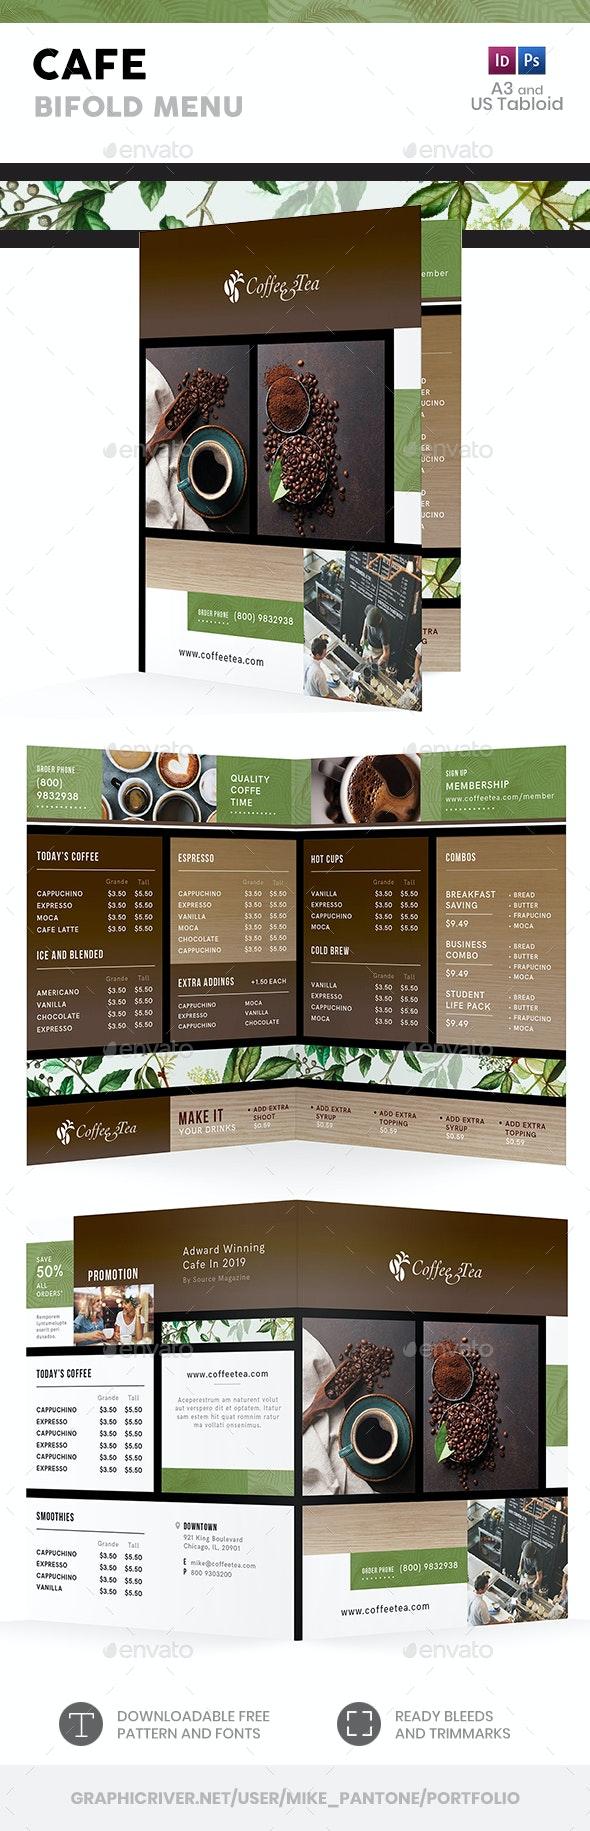 Cafe Bifold / Halffold Menu 3 - Food Menus Print Templates